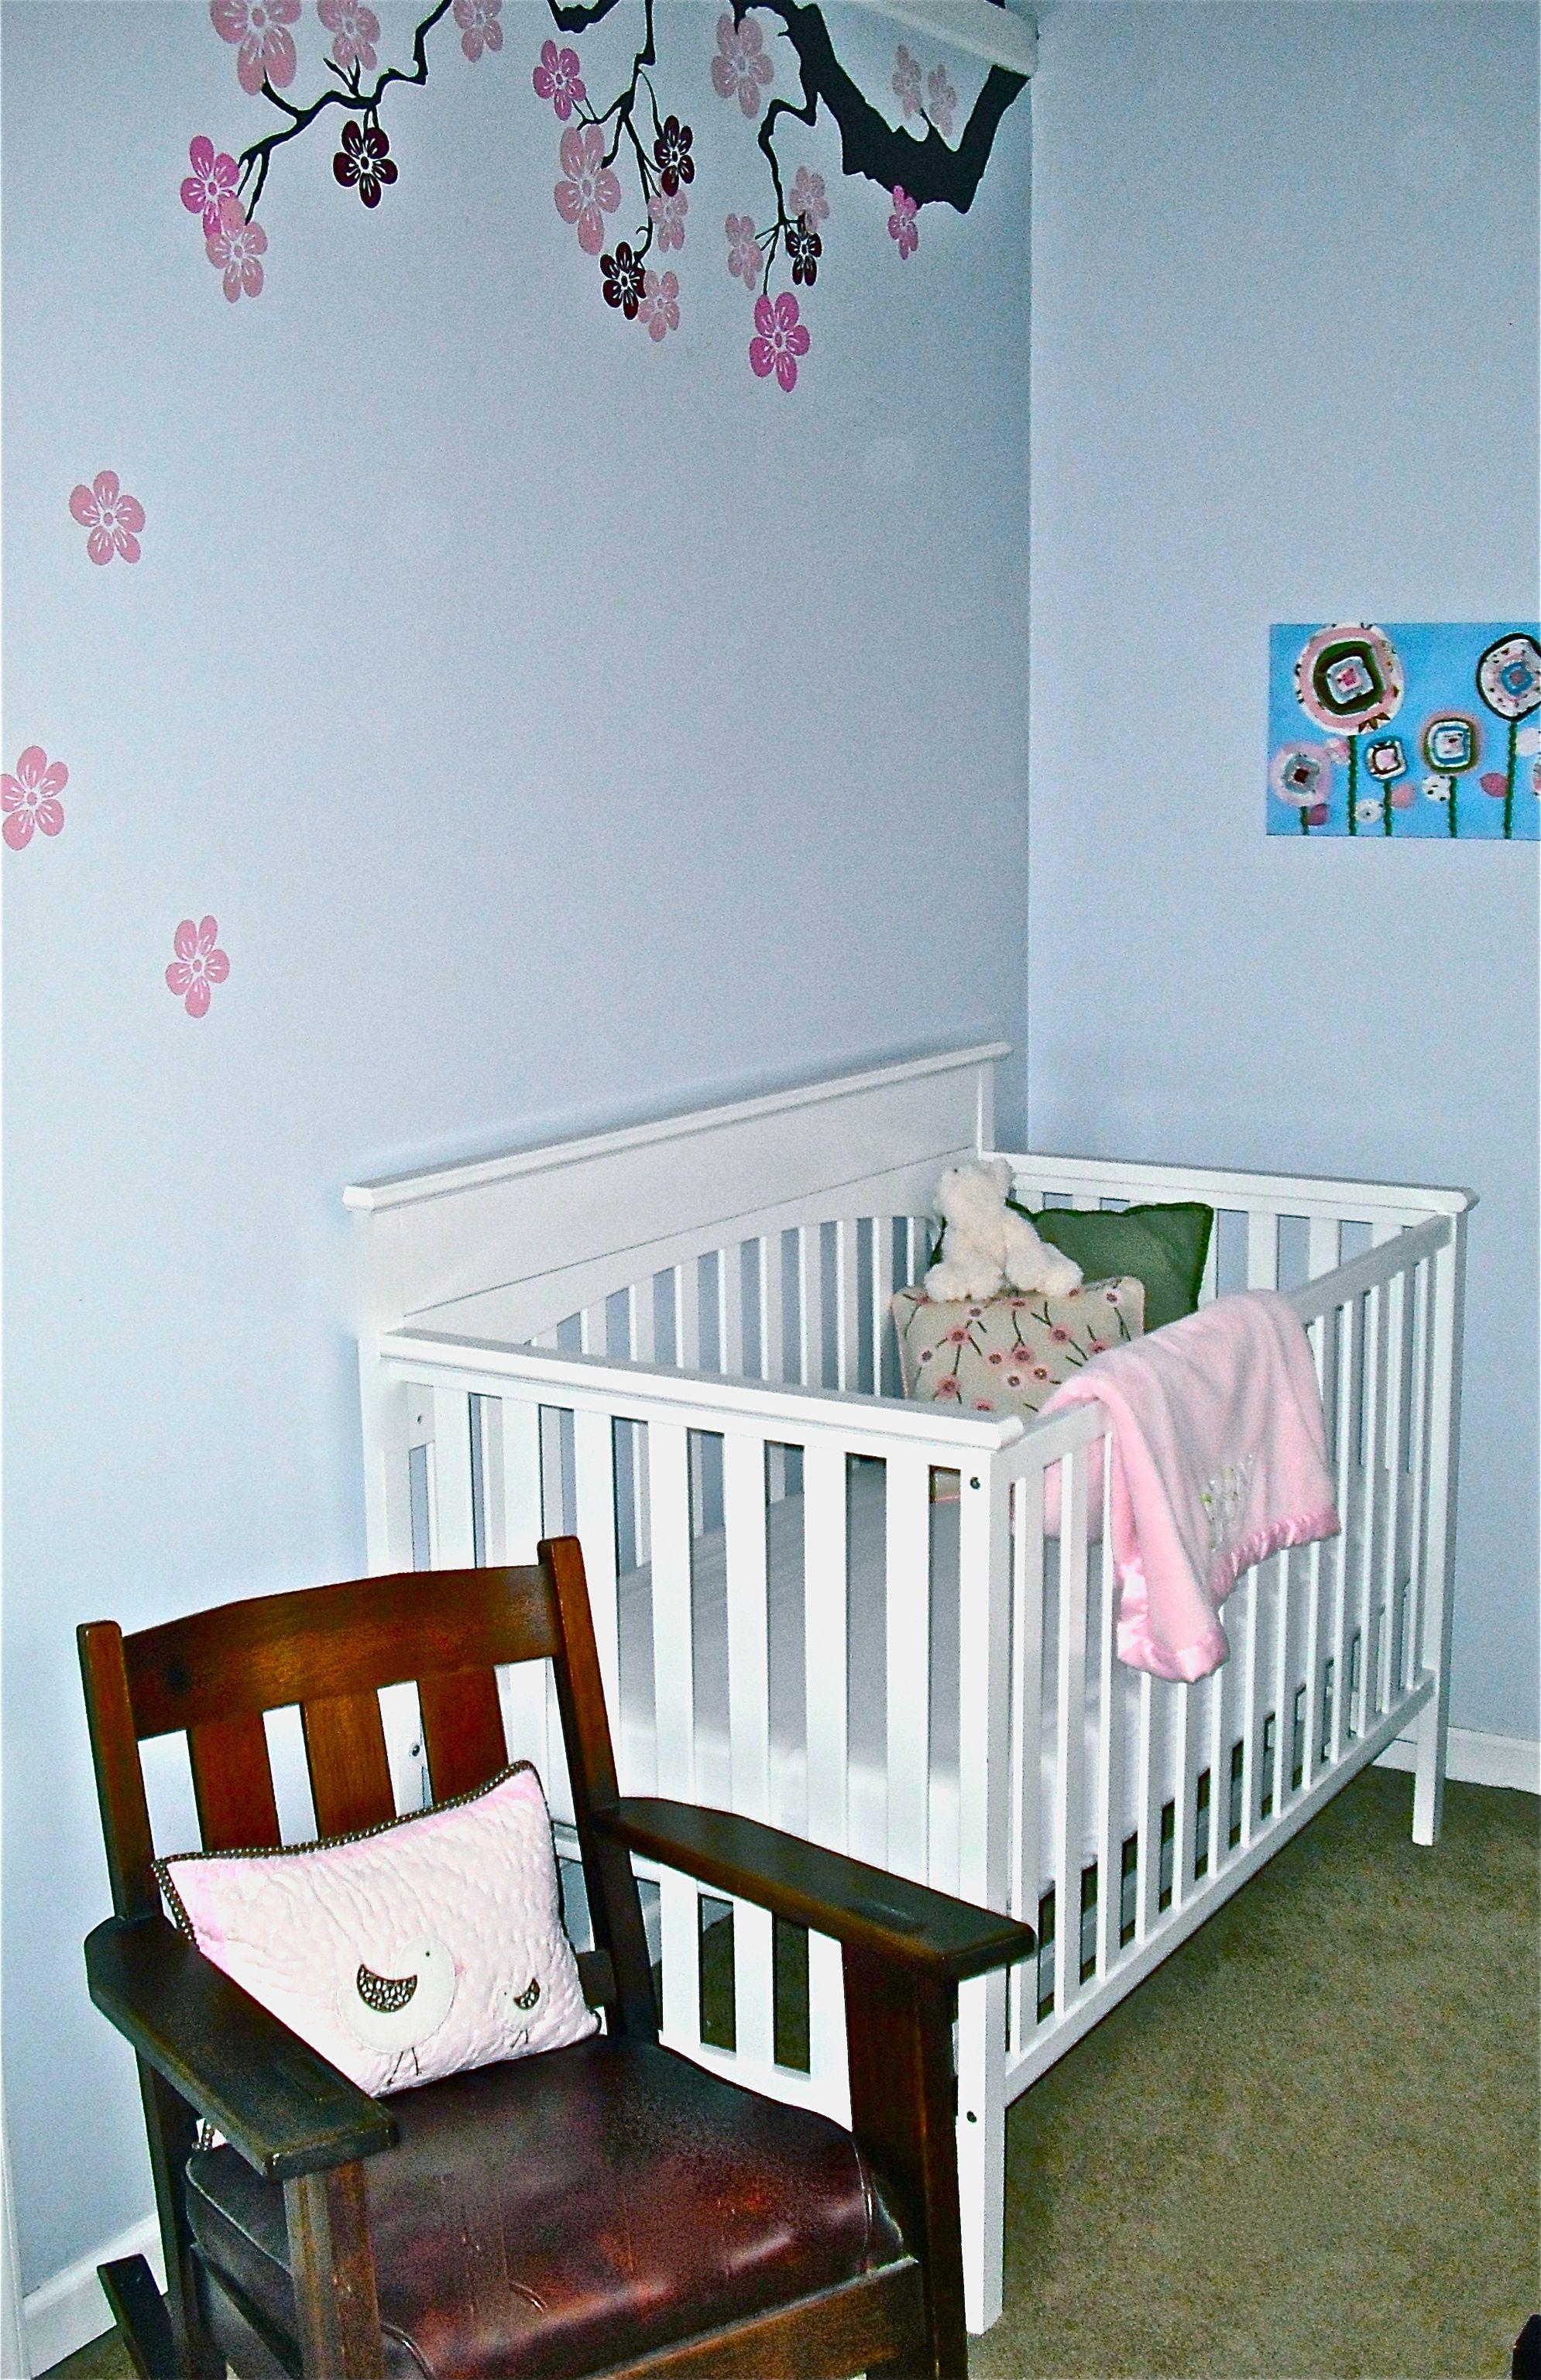 Sophie S Whimsical Nursery Project Nursery